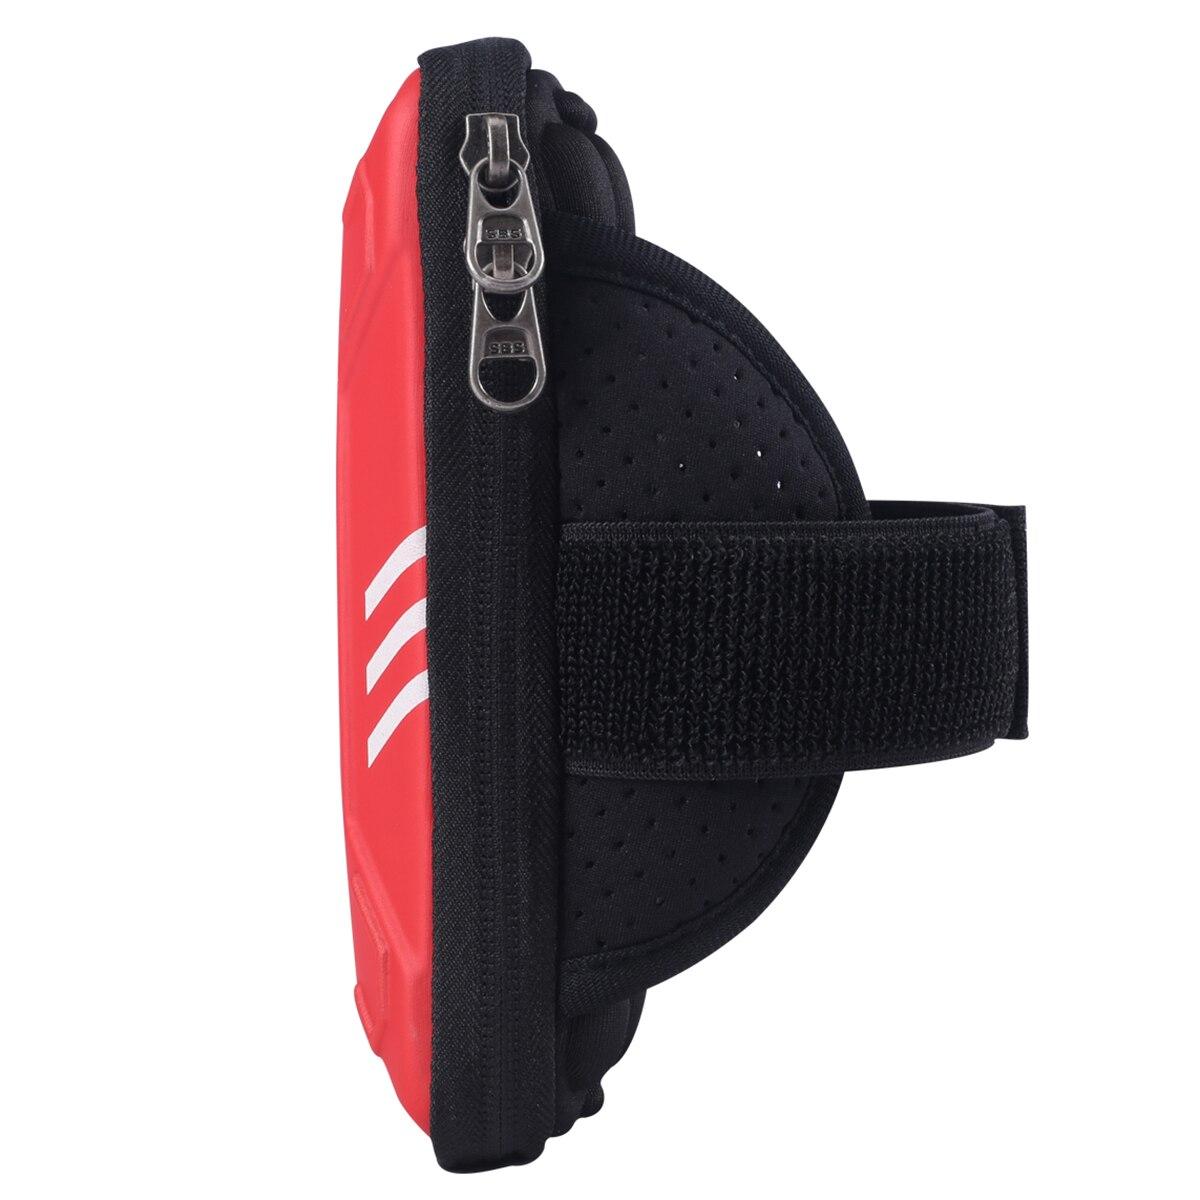 d27cba1f8 Yipinu pequeño impermeable Fitness corriendo bolso cartera correr teléfono  monedero brazalete gimnasio brazo deportes bolsa de